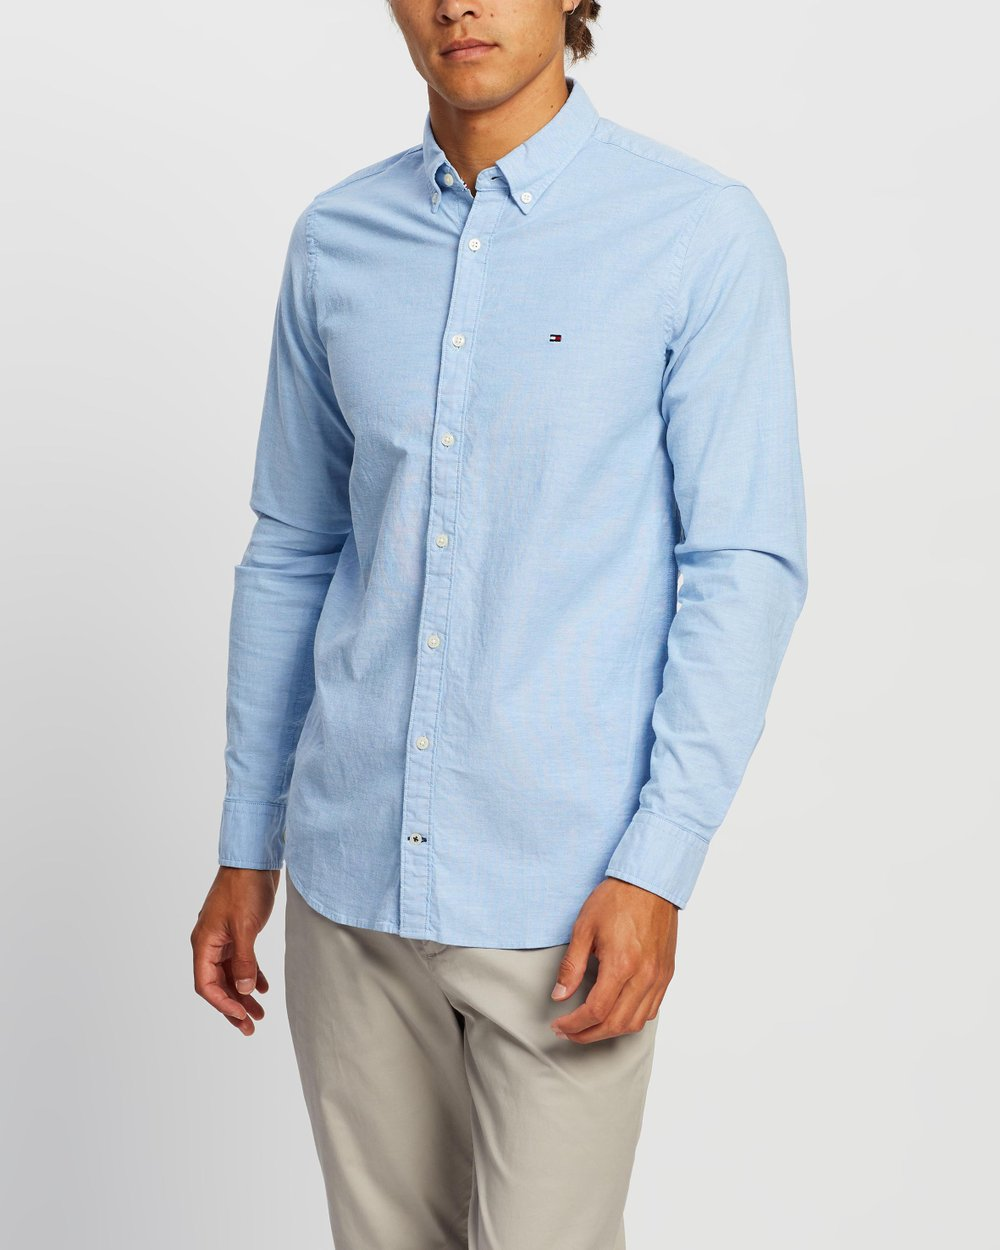 49a17149c74 Stretch Slim Oxford Shirt by Tommy Hilfiger Online